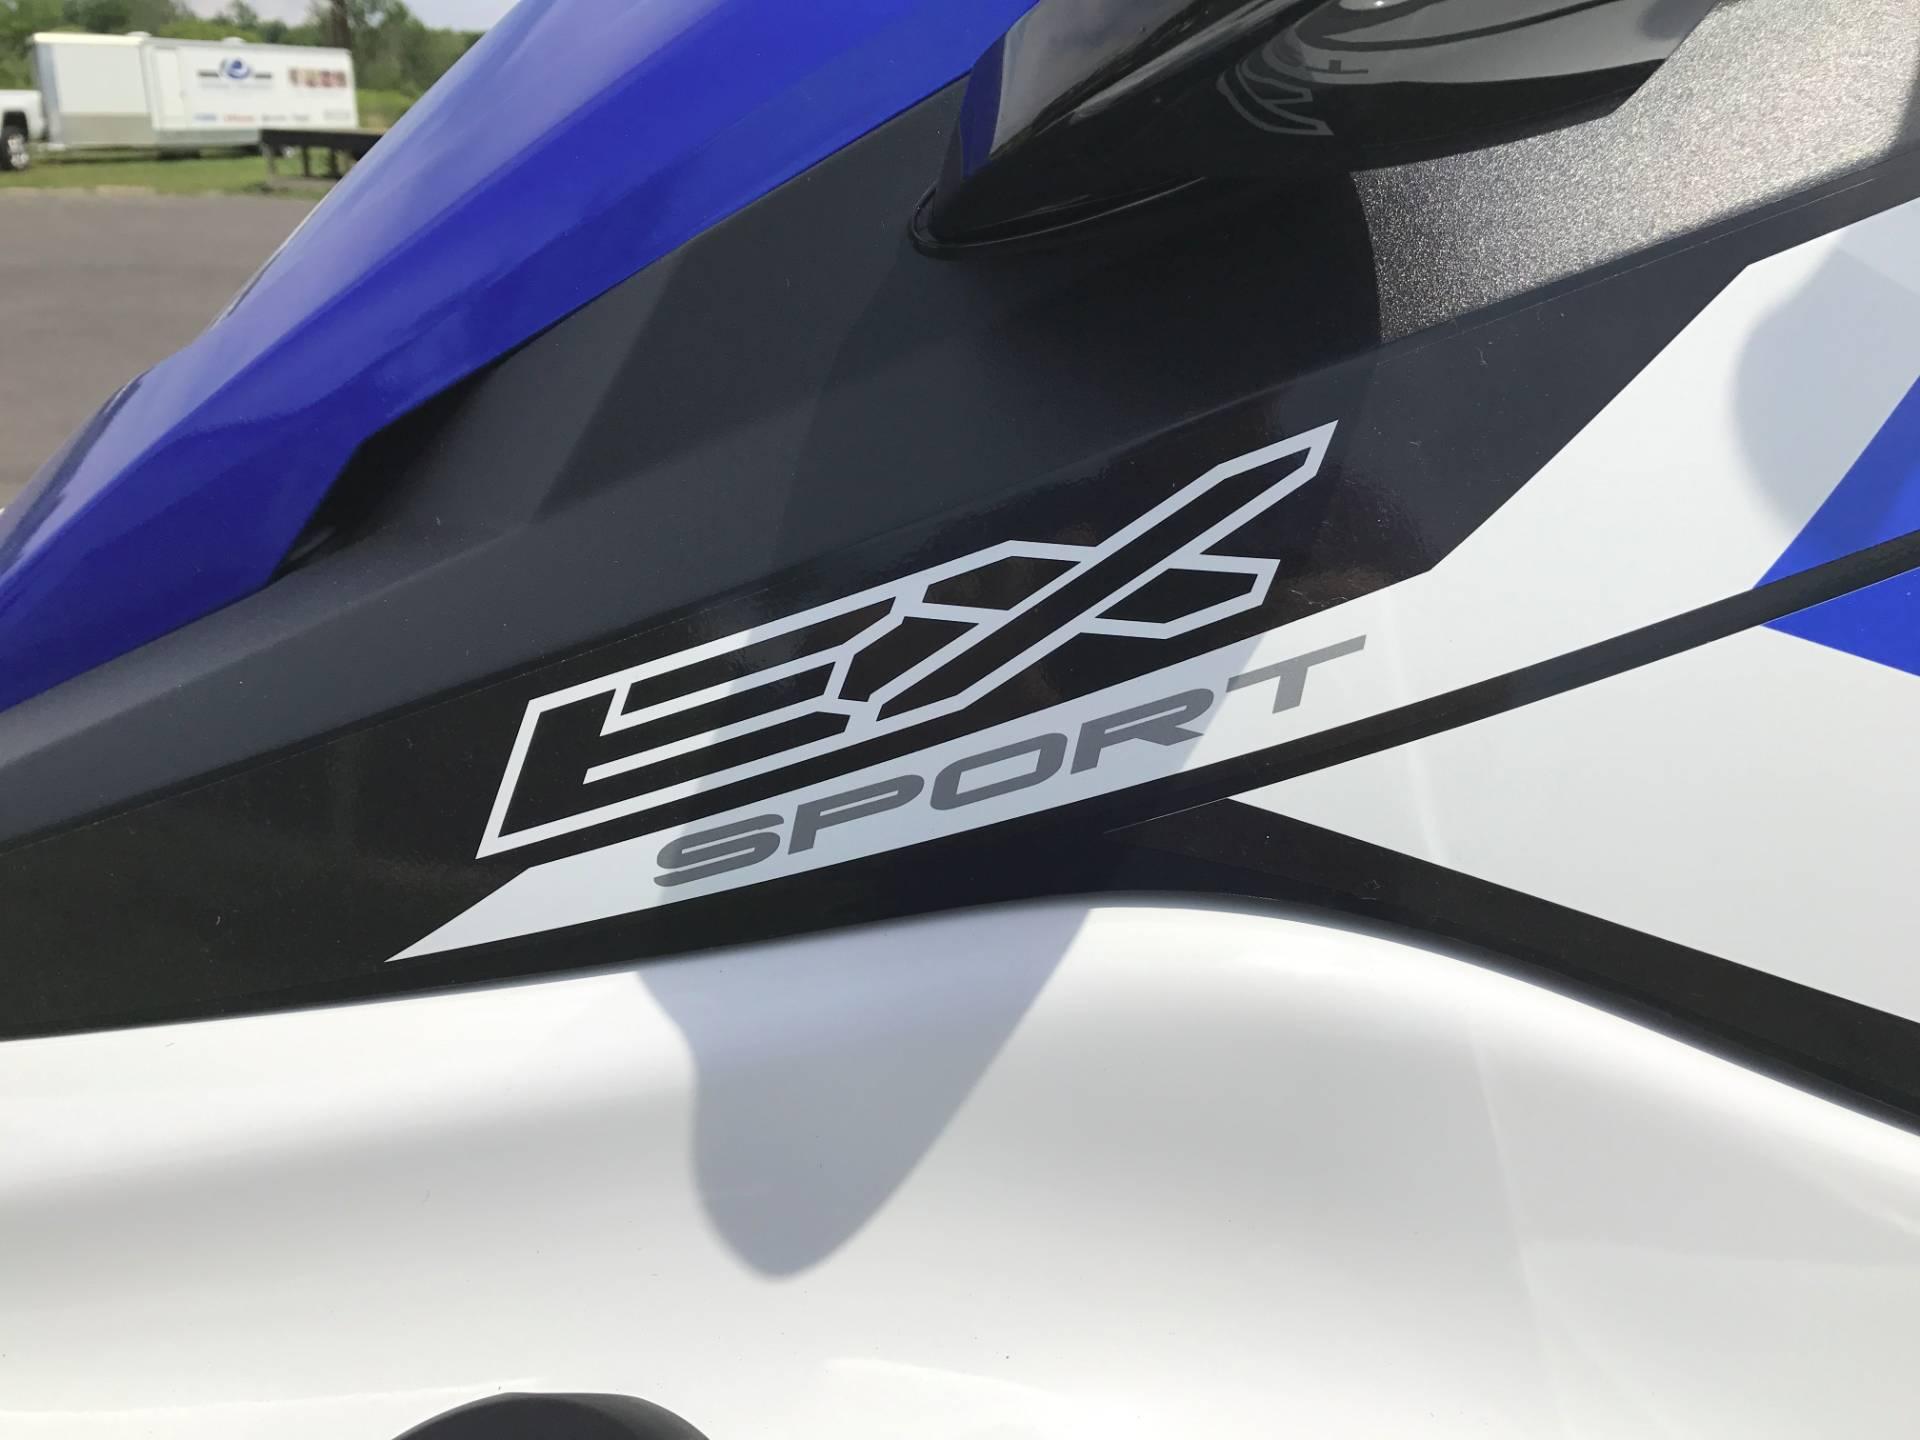 2017 Yamaha EX Sport 3